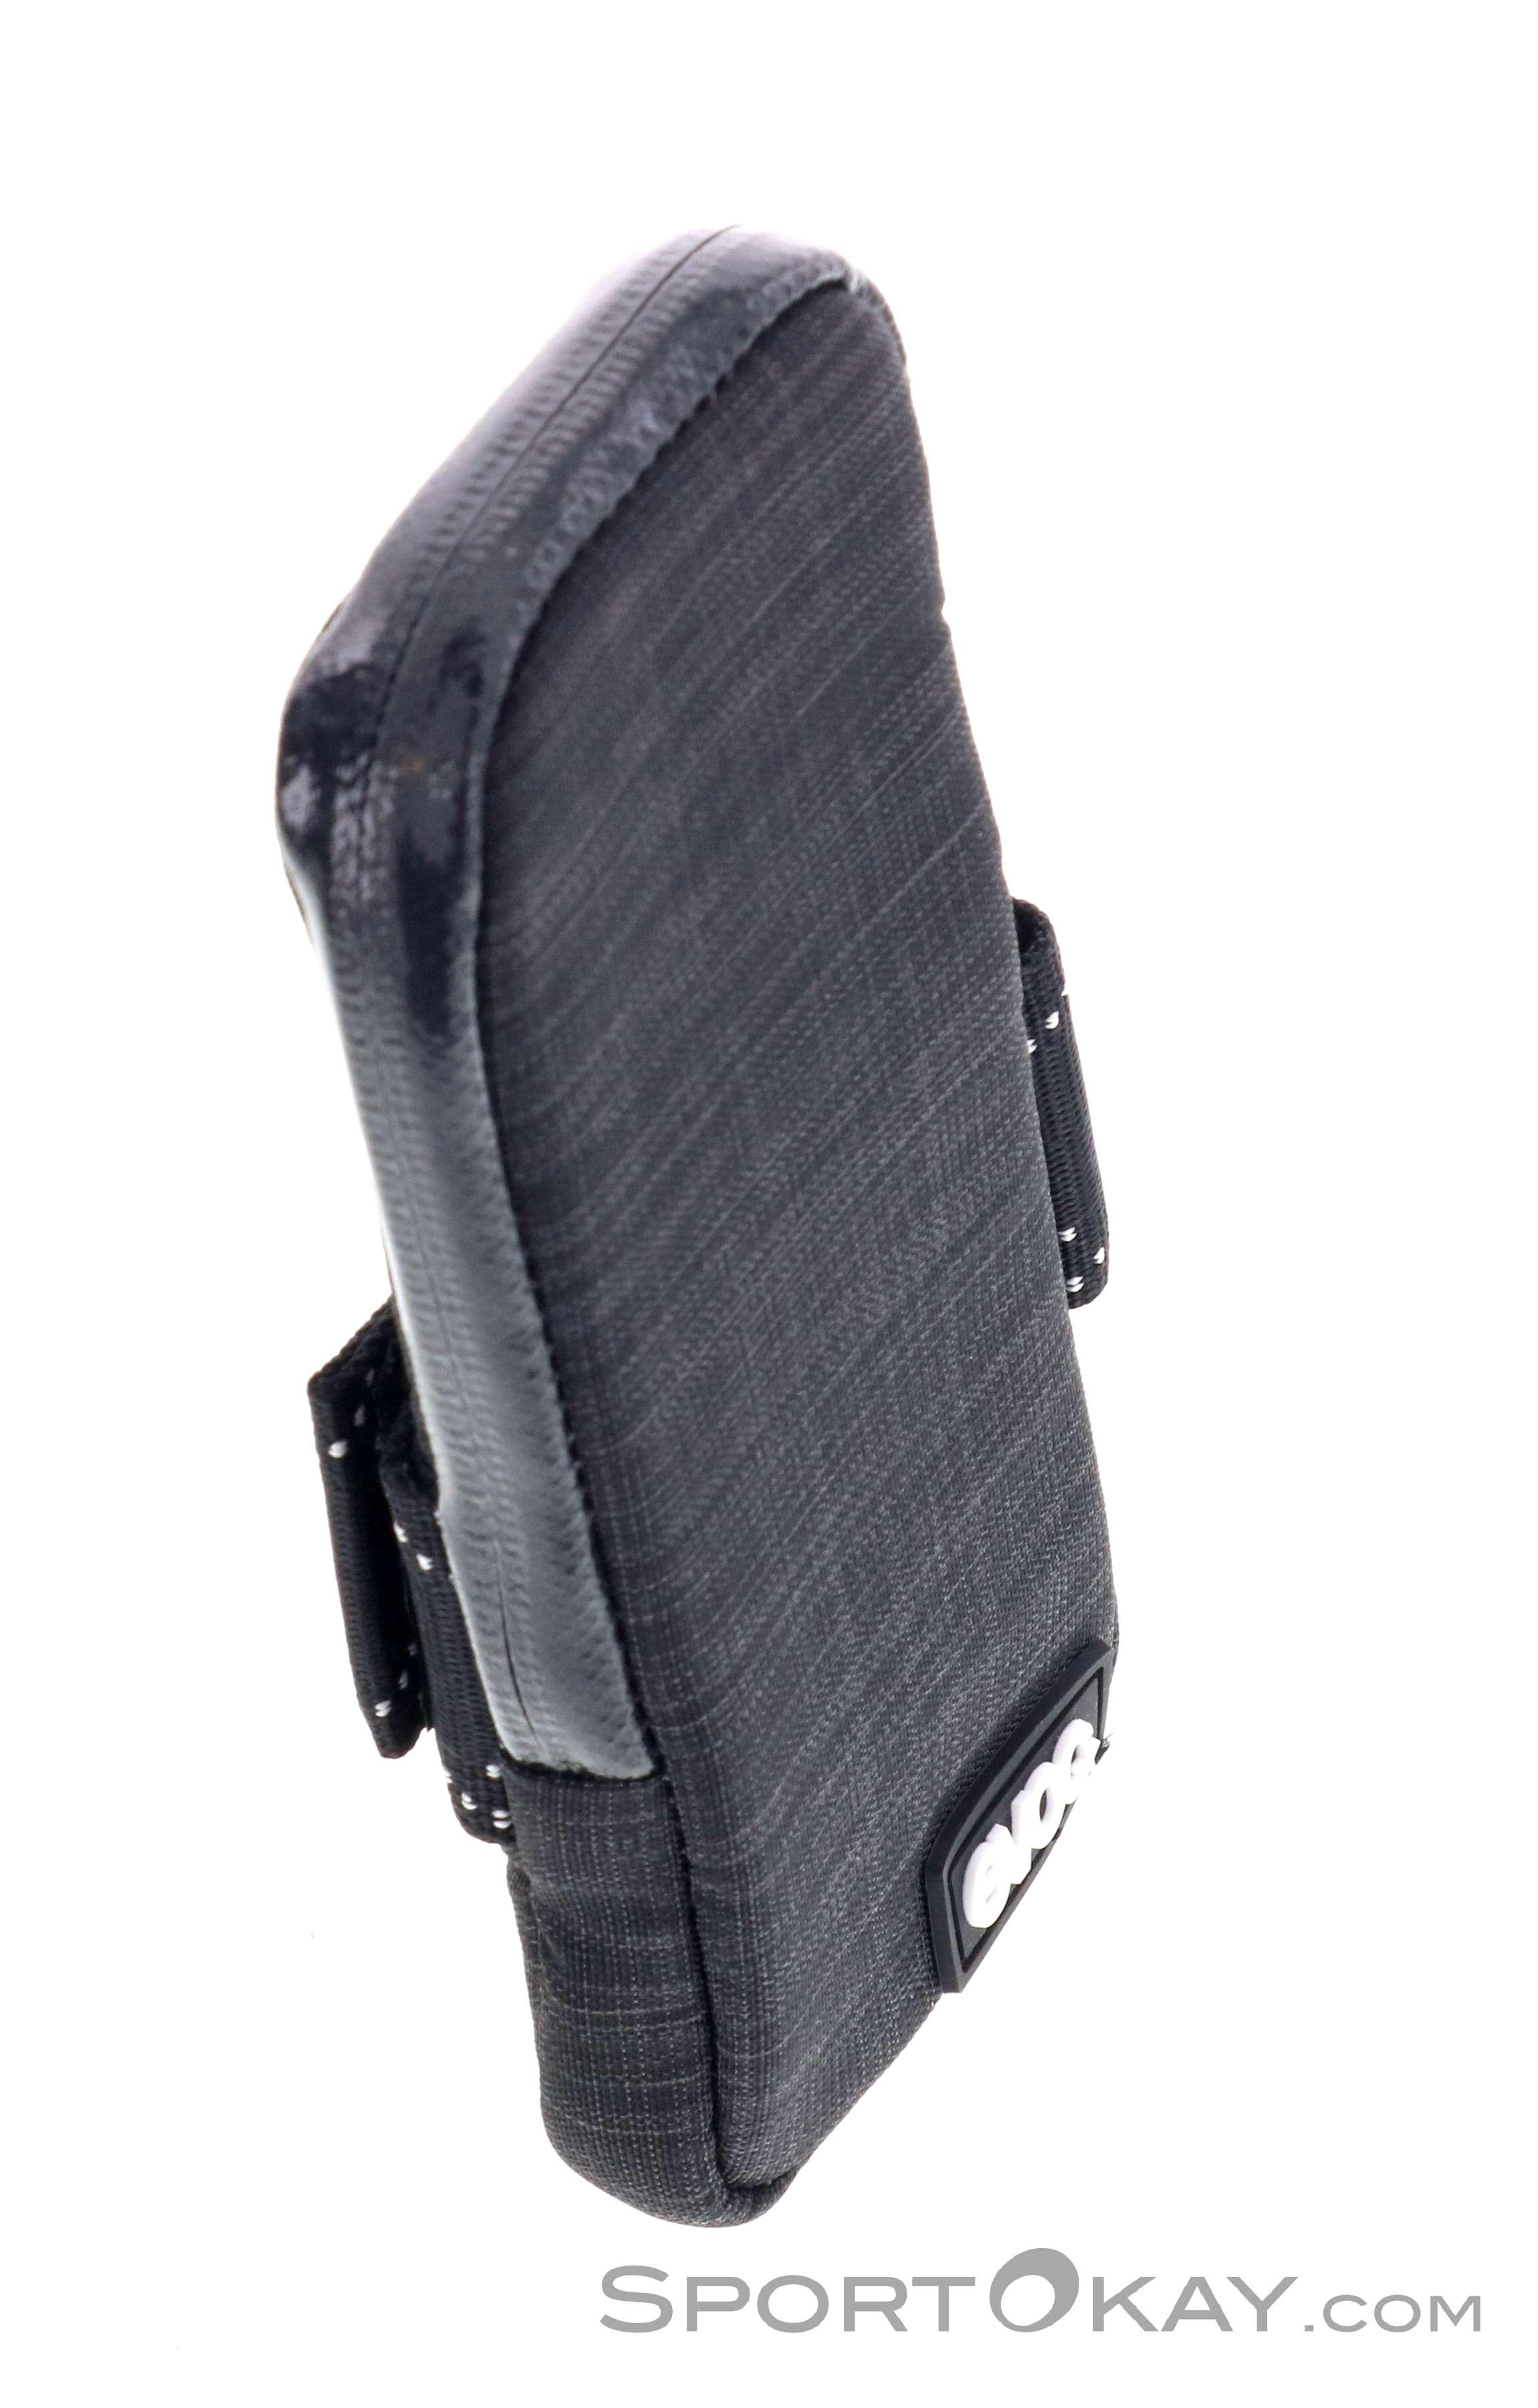 Evoc Evoc Phone Case L Handytasche